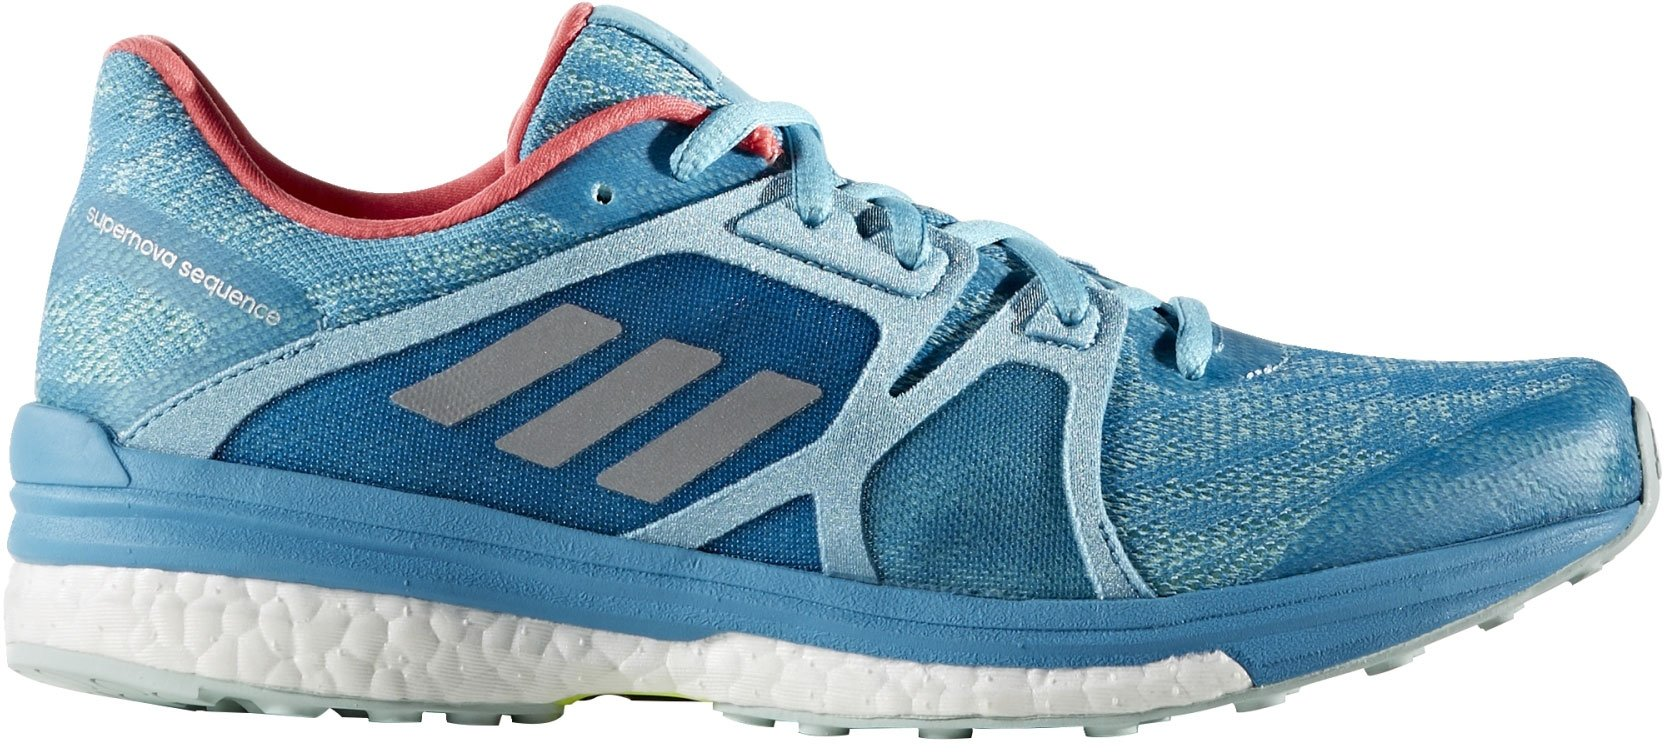 Běžecké boty adidas Supernova Sequence 9